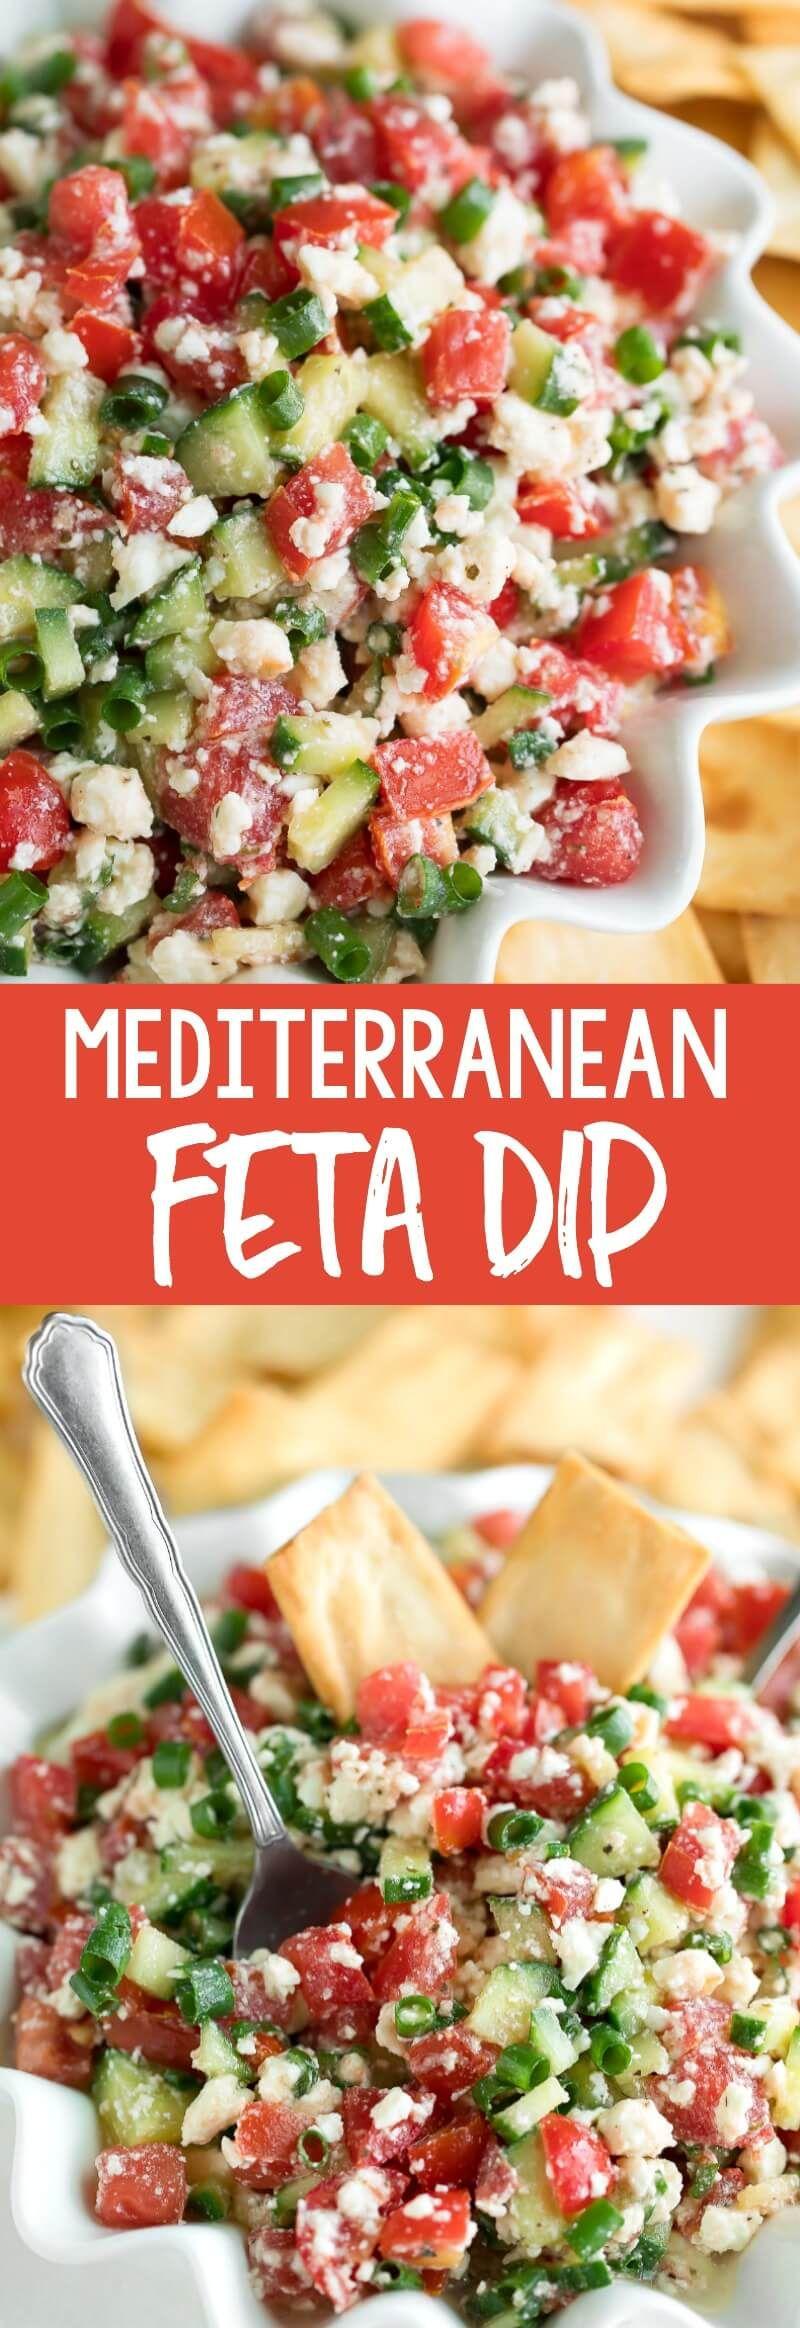 Mediterranean Feta Dip - Appetizer + Salad Topper!